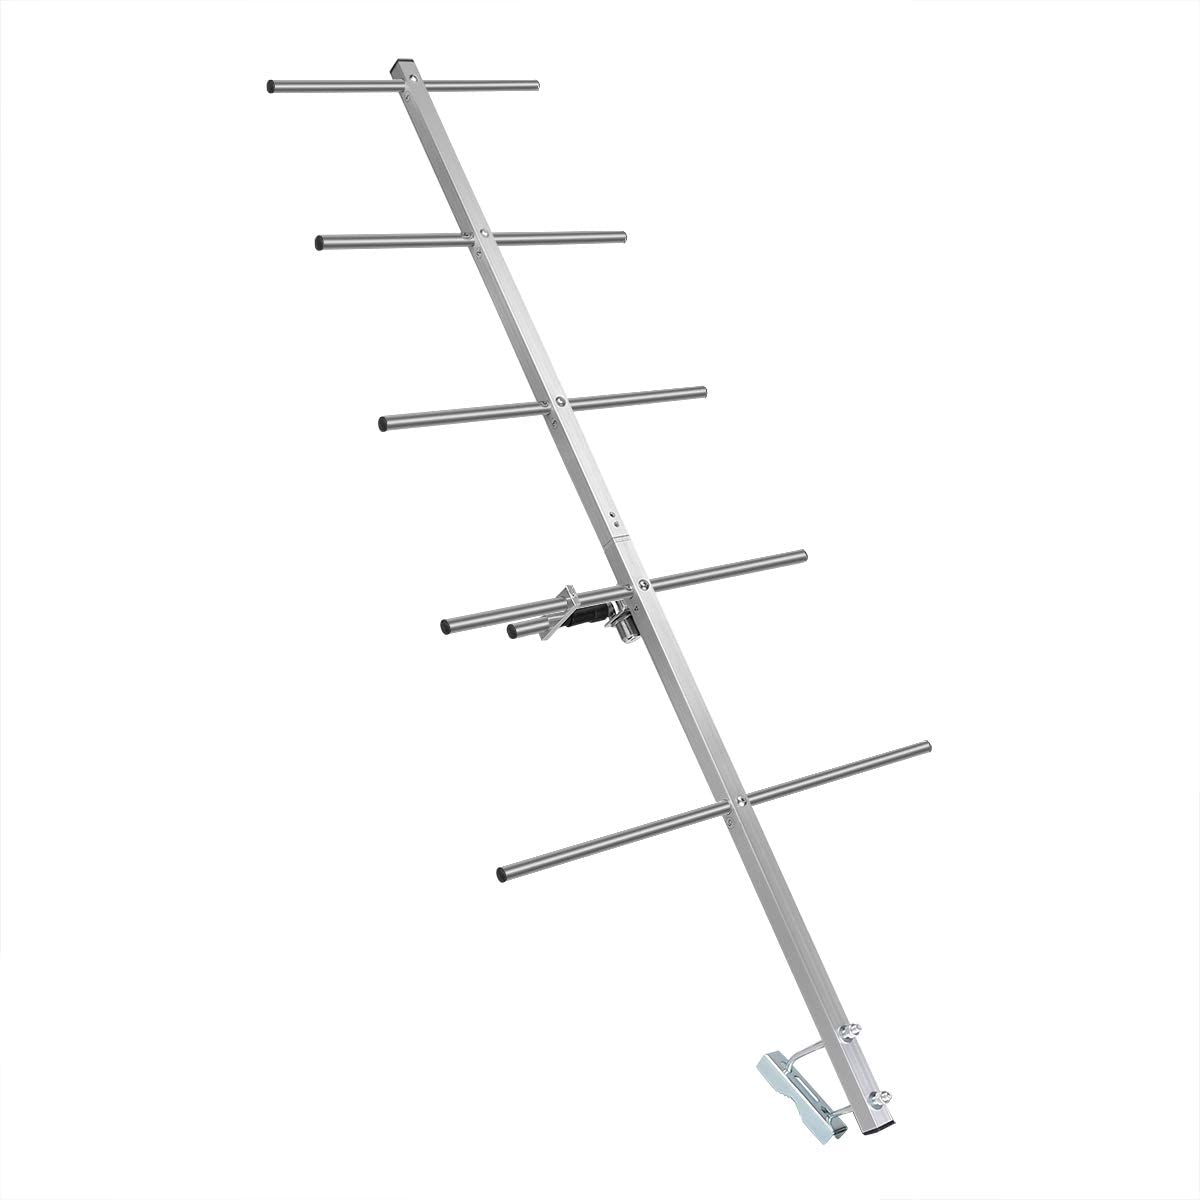 Plata, 1 Pieza Ailunce AY03 Yagi Antena Alta Ganancia 9 dBi UHF Hembra 5 Elementos Antena Direccional Compatible con Ailunce HD1 Compatible con Retevis RT29 RT87 RT3S TYT MD-380 UV-5R